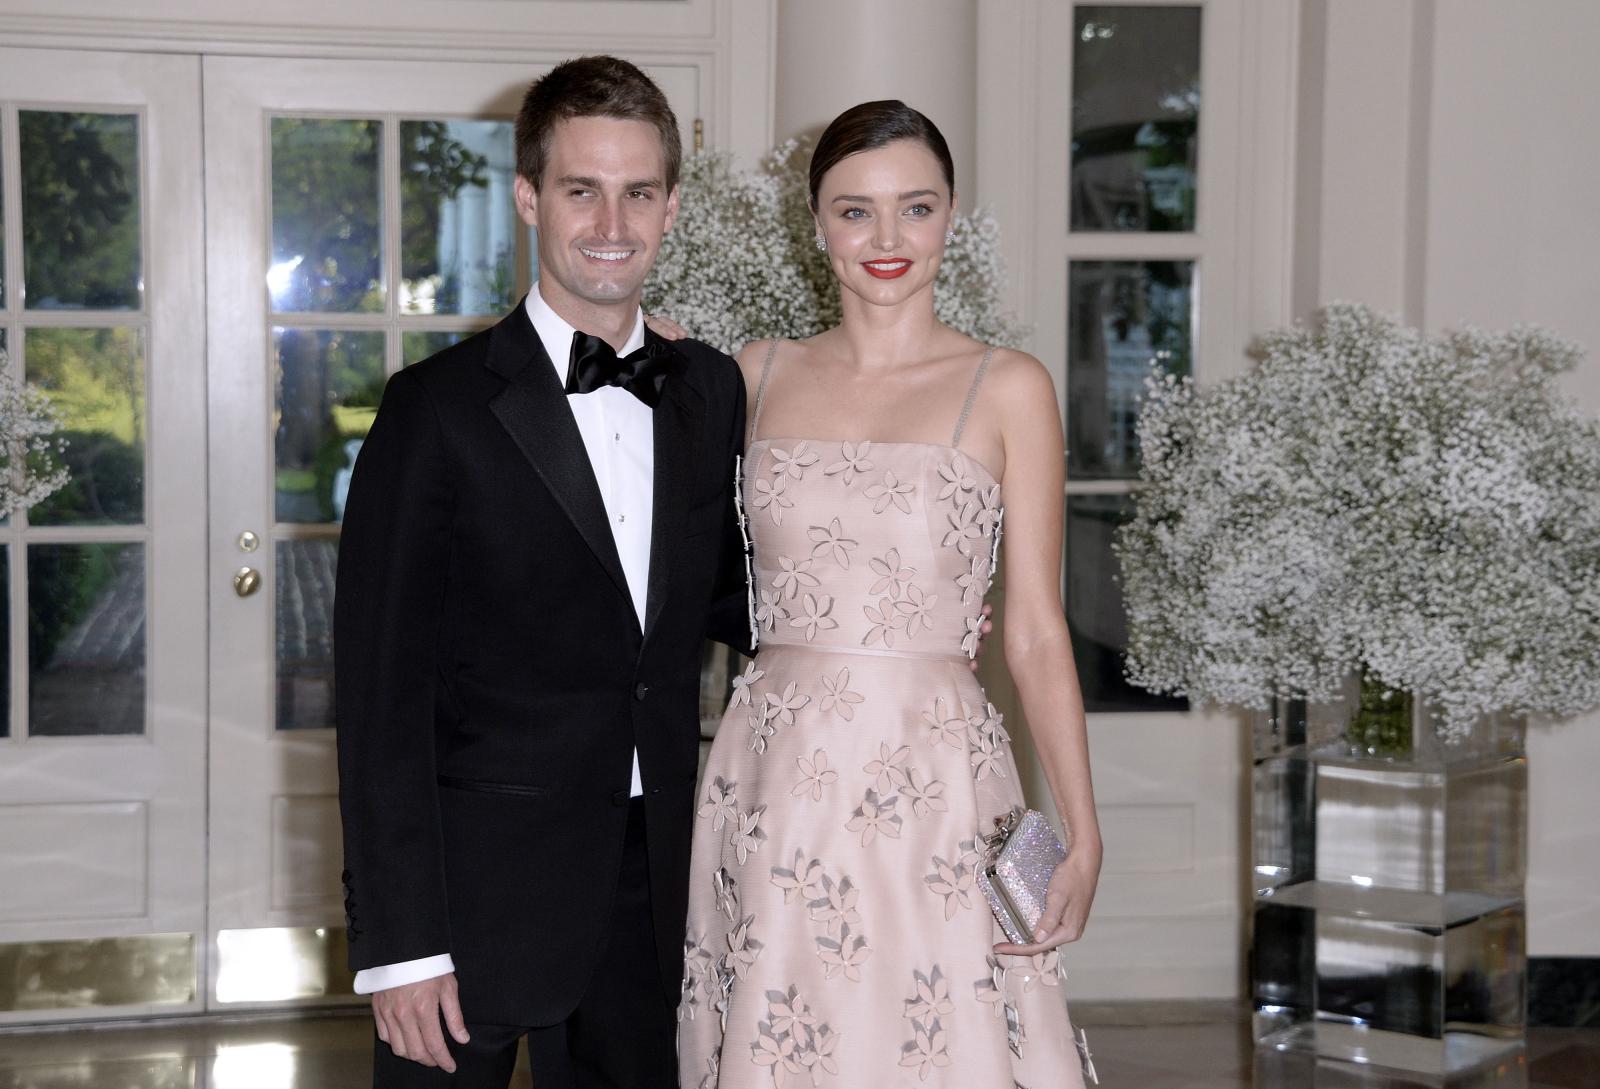 Snapchat founder Evan Spiegel to marry Victoria's Secret Angel Miranda Kerr